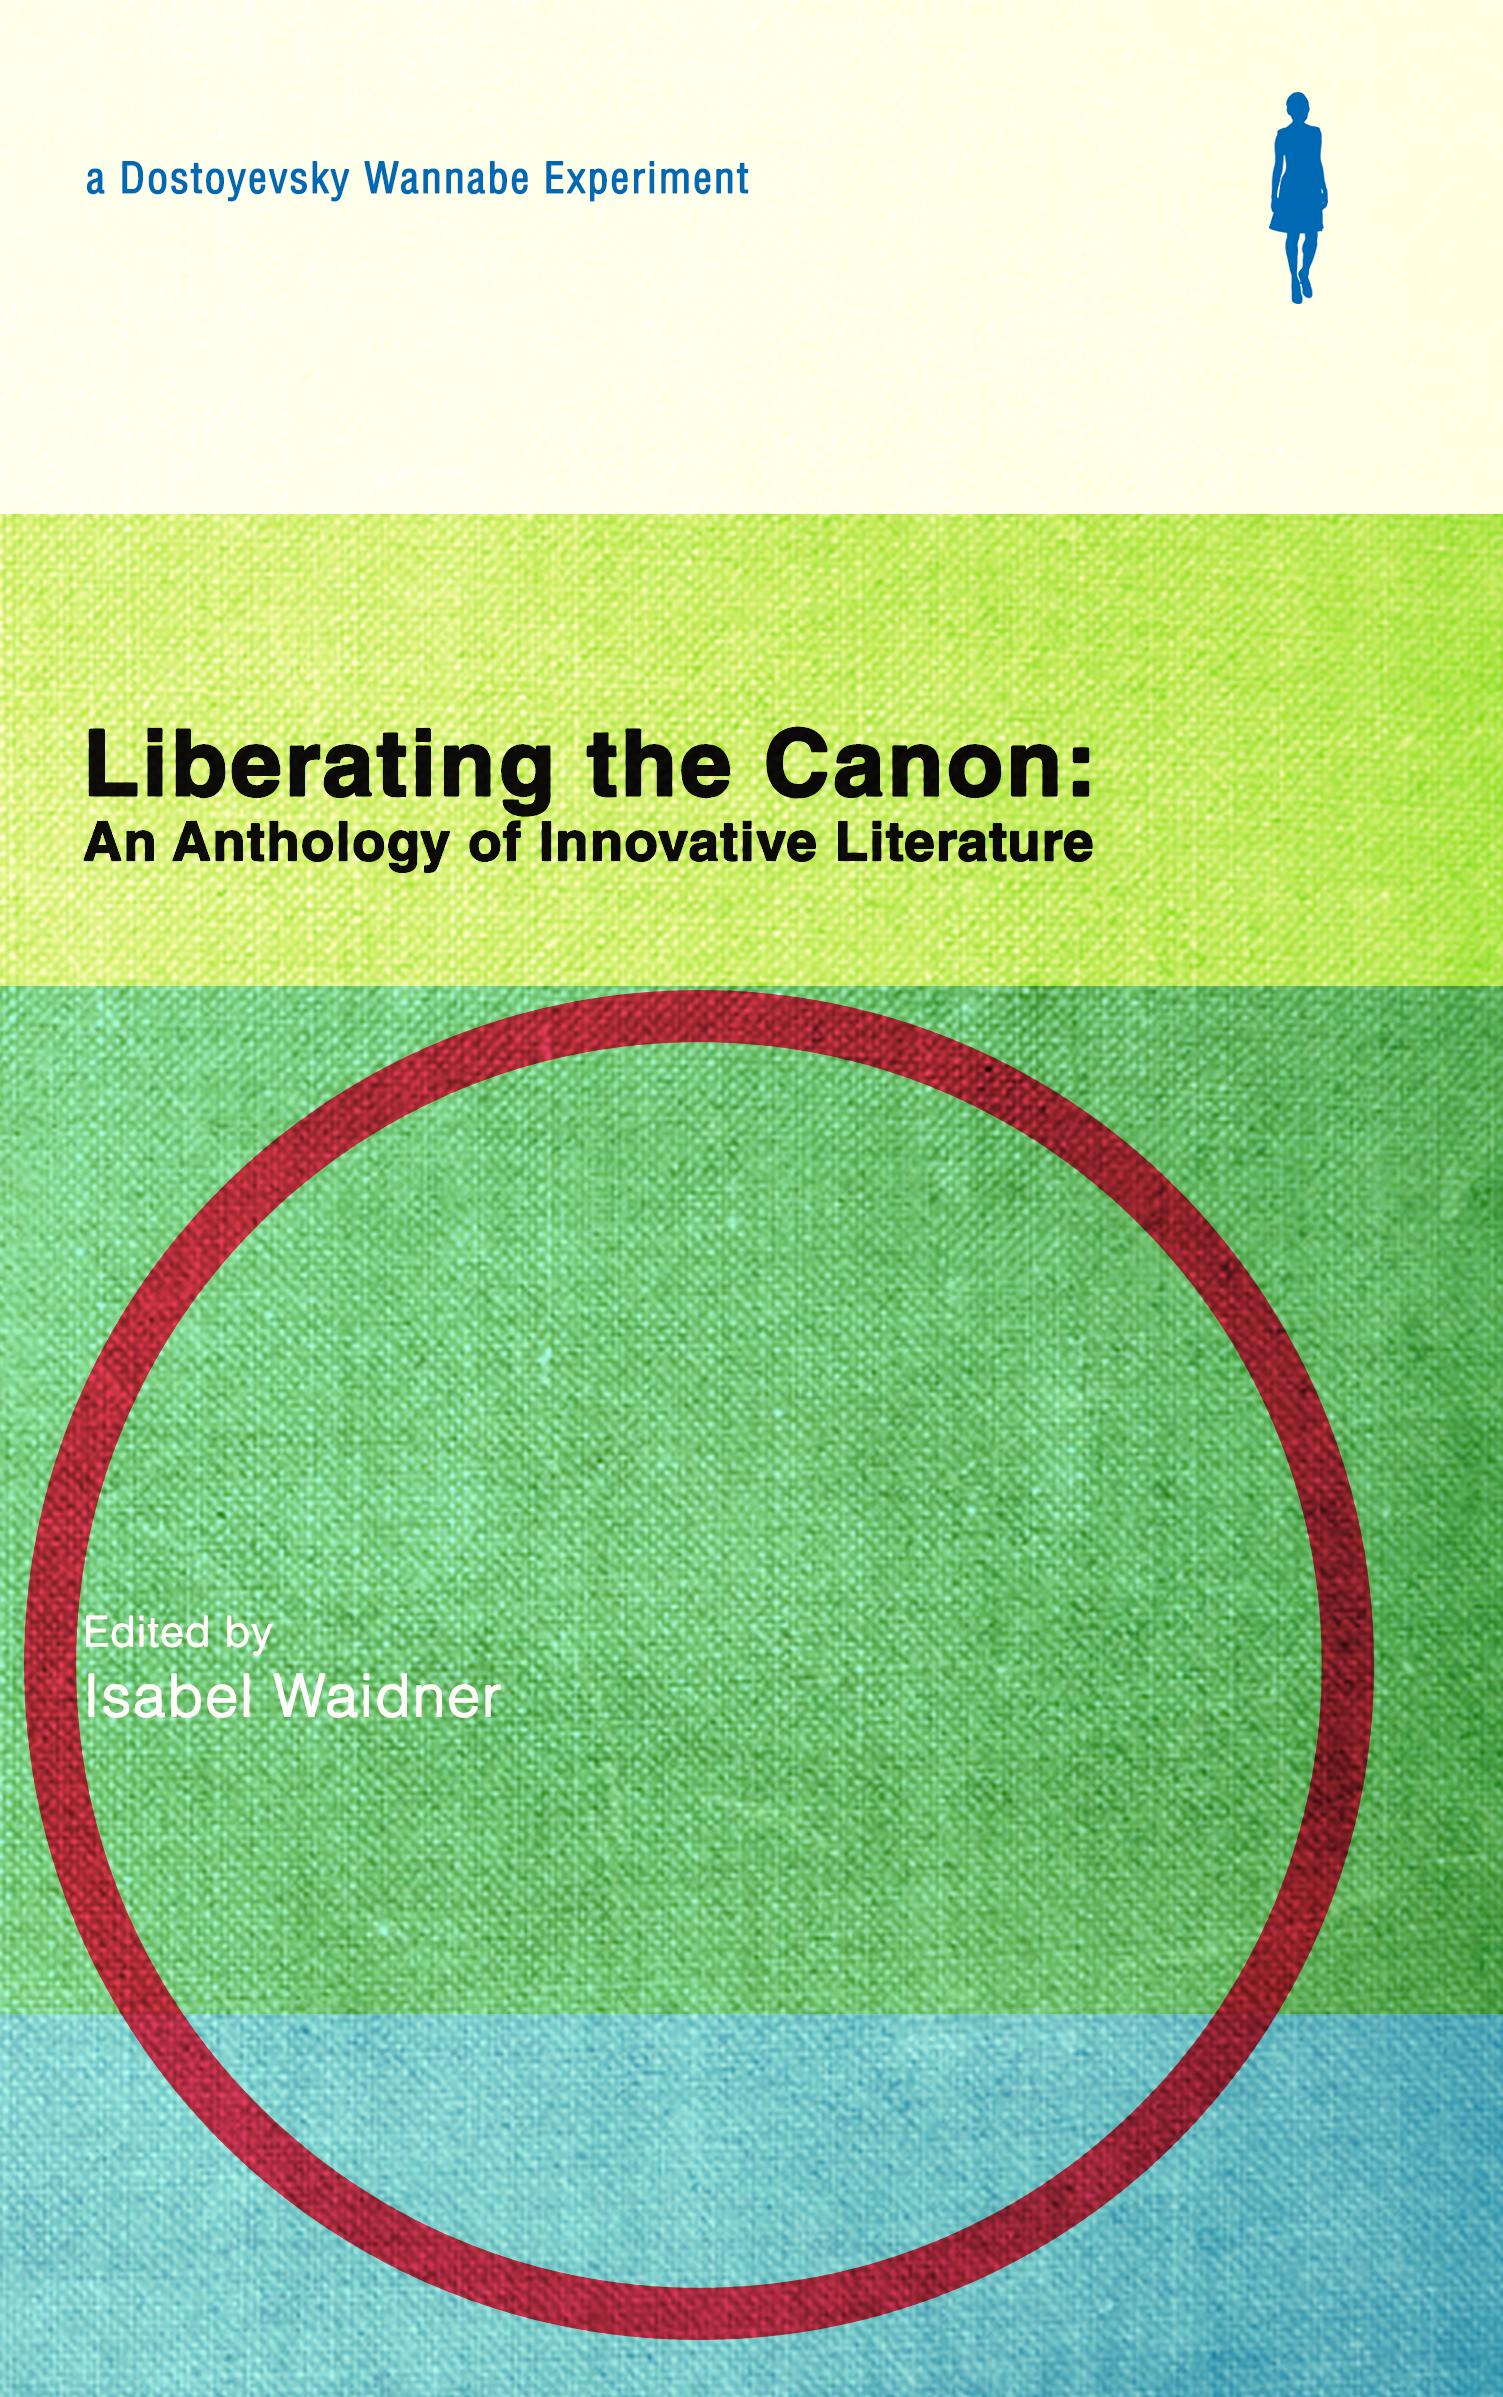 liberating_the_canon.jpg